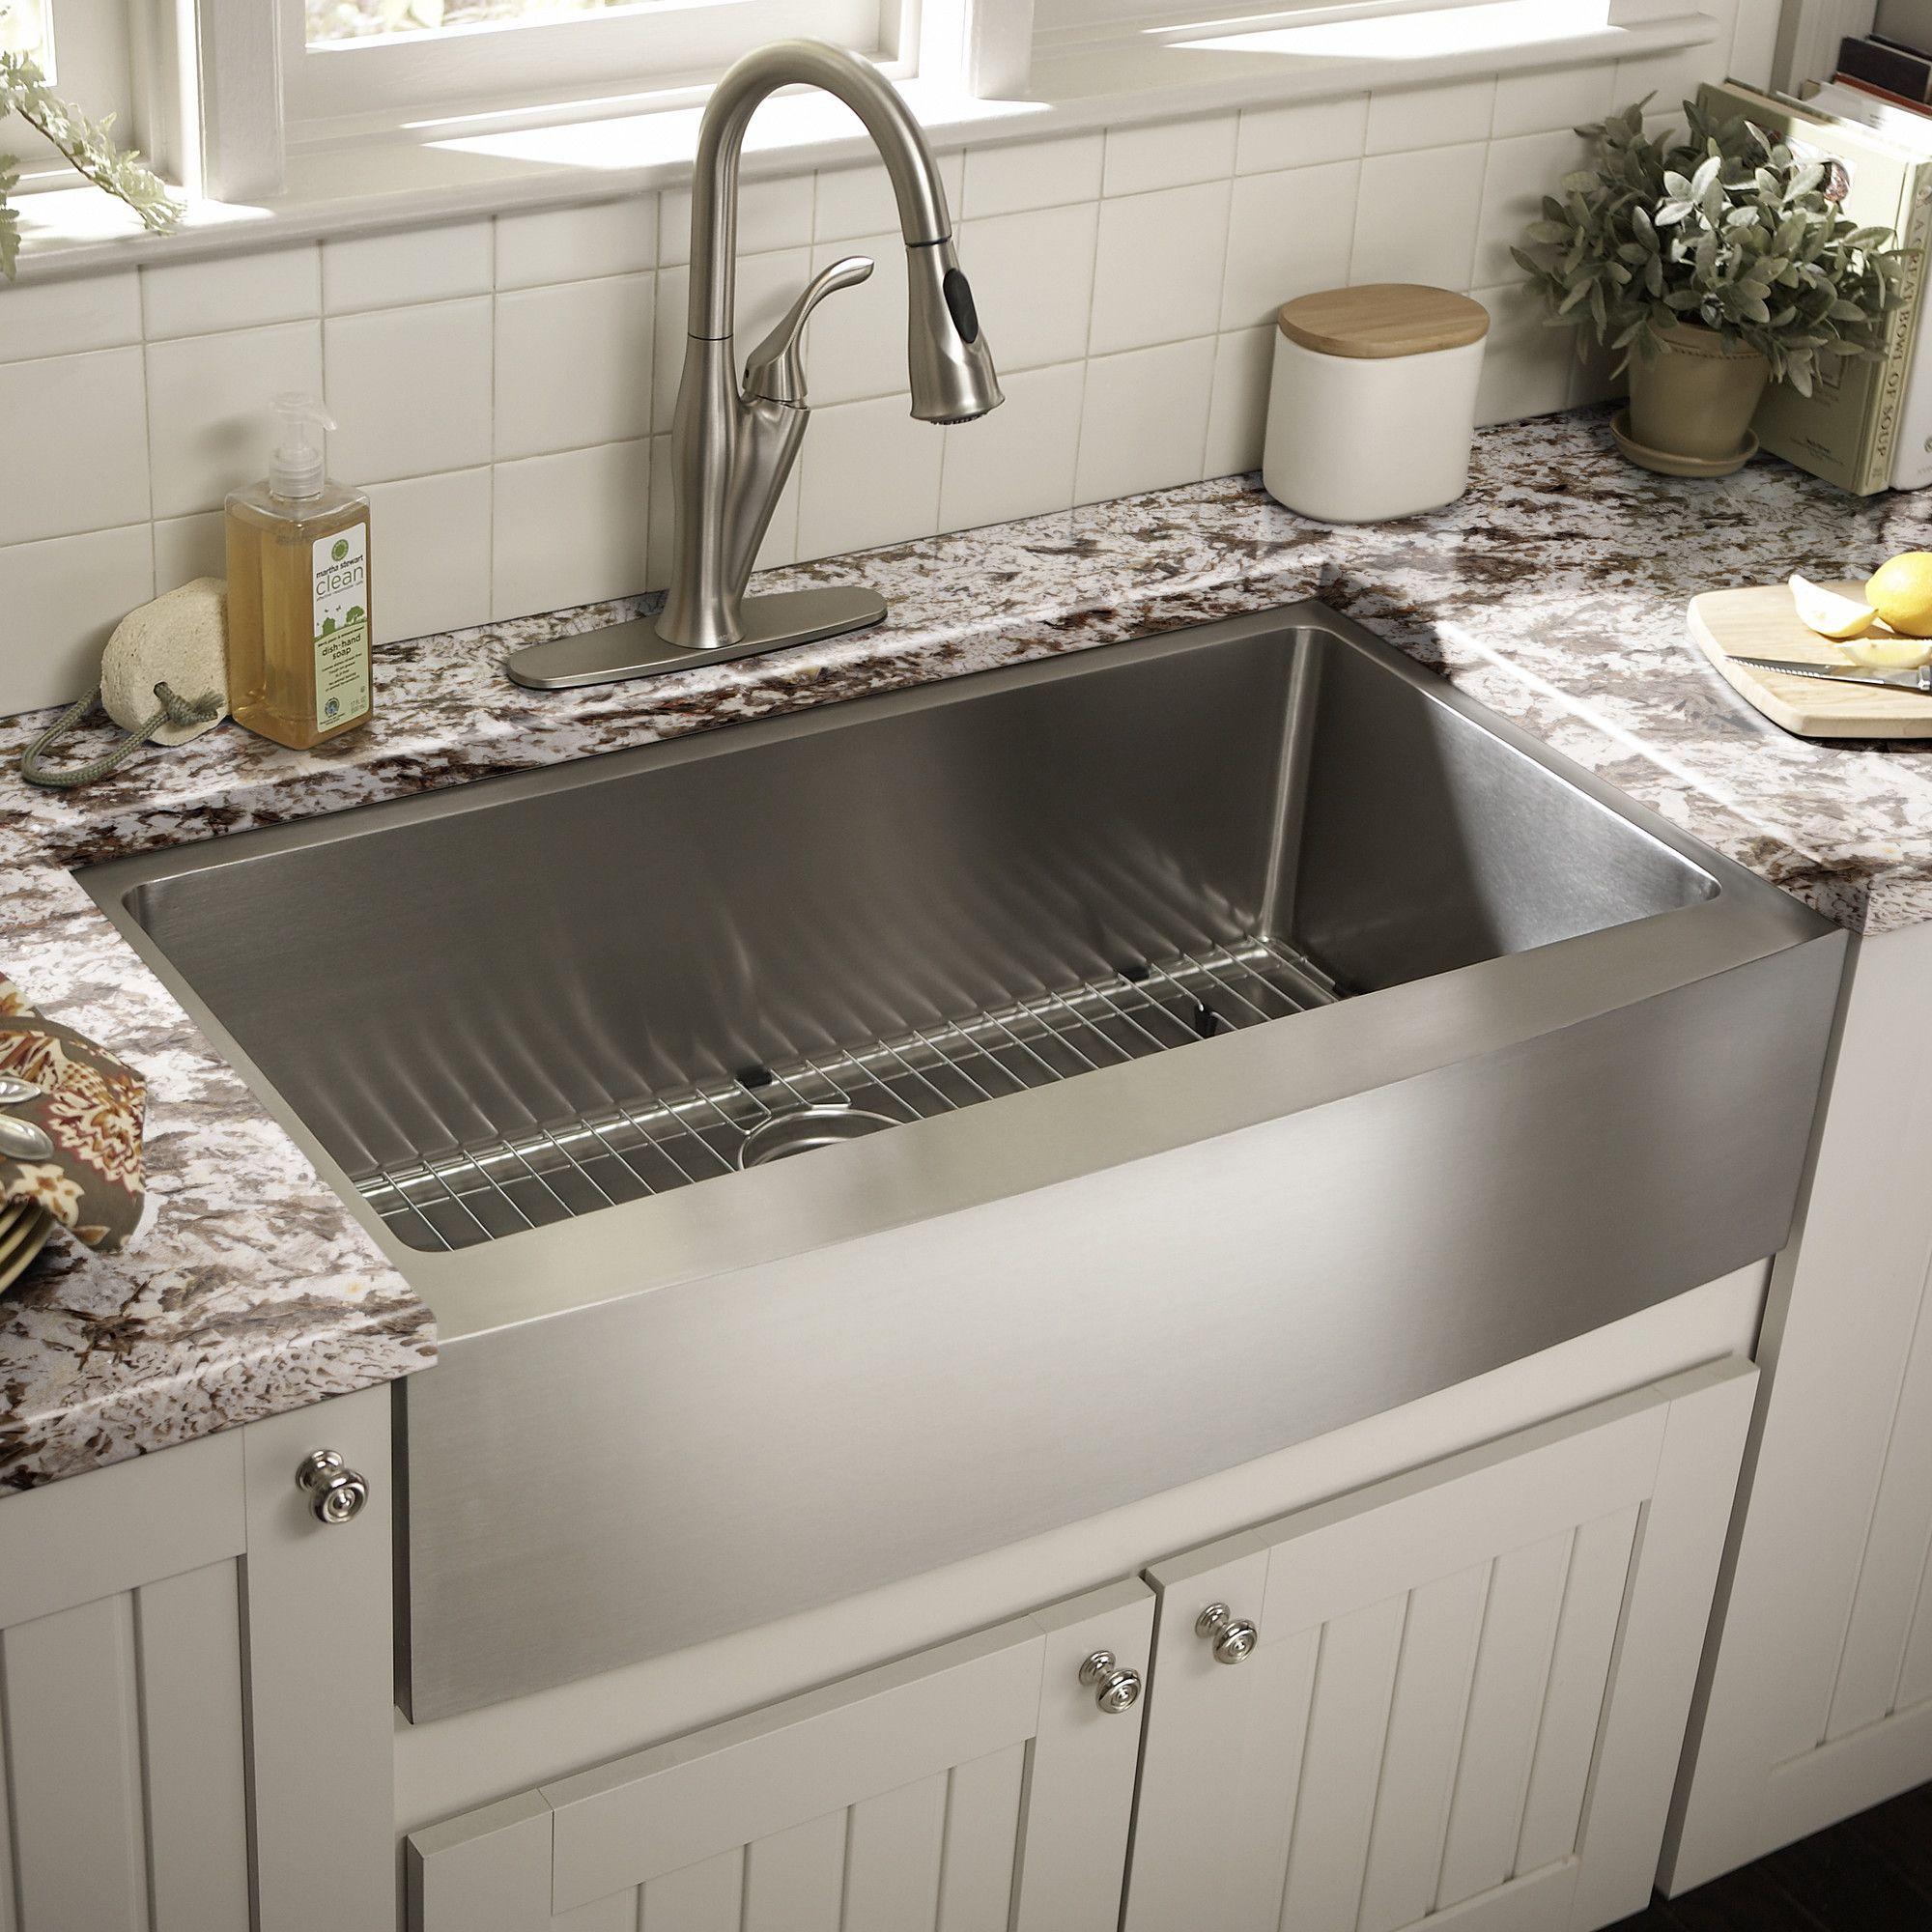 Found It At Allmodern Strong Schon Strong 22 Single Bowl Farmhouse Kitchen Si Farmhouse Sink Kitchen Kitchen Sink Decor Sinks Kitchen Stainless